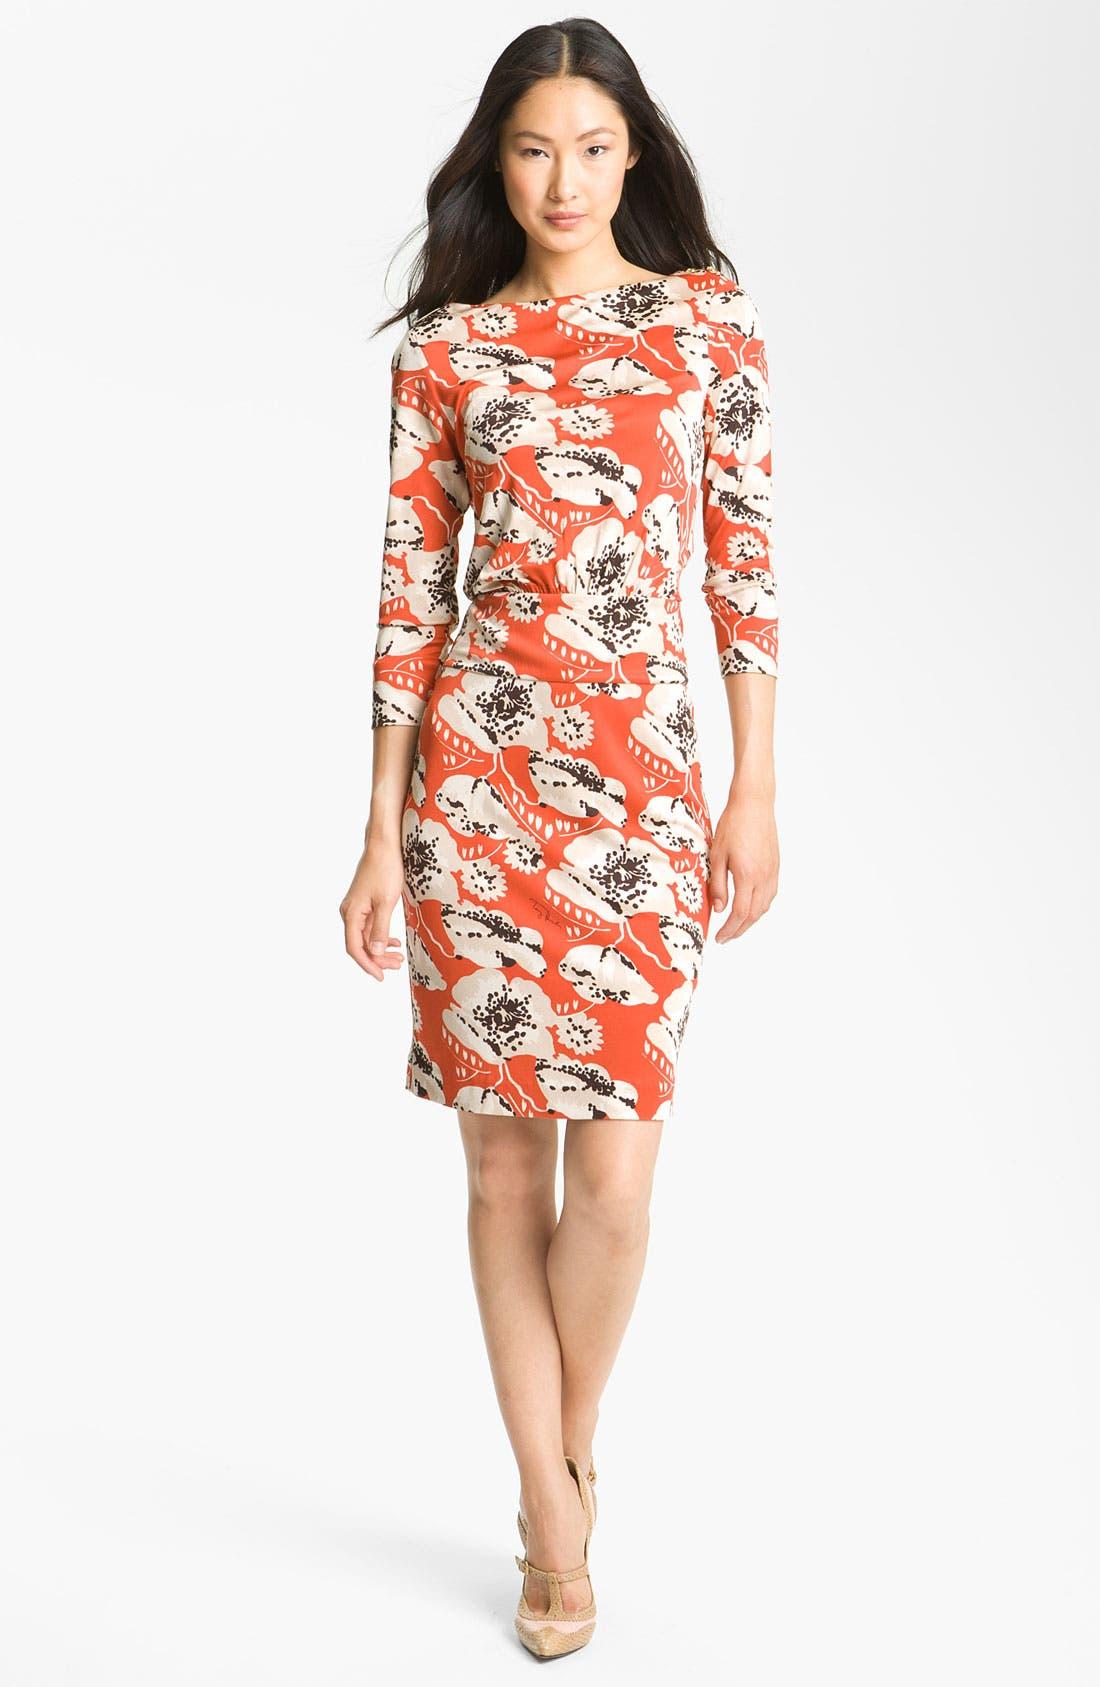 Alternate Image 1 Selected - Tory Burch 'Sheila' Silk Dress